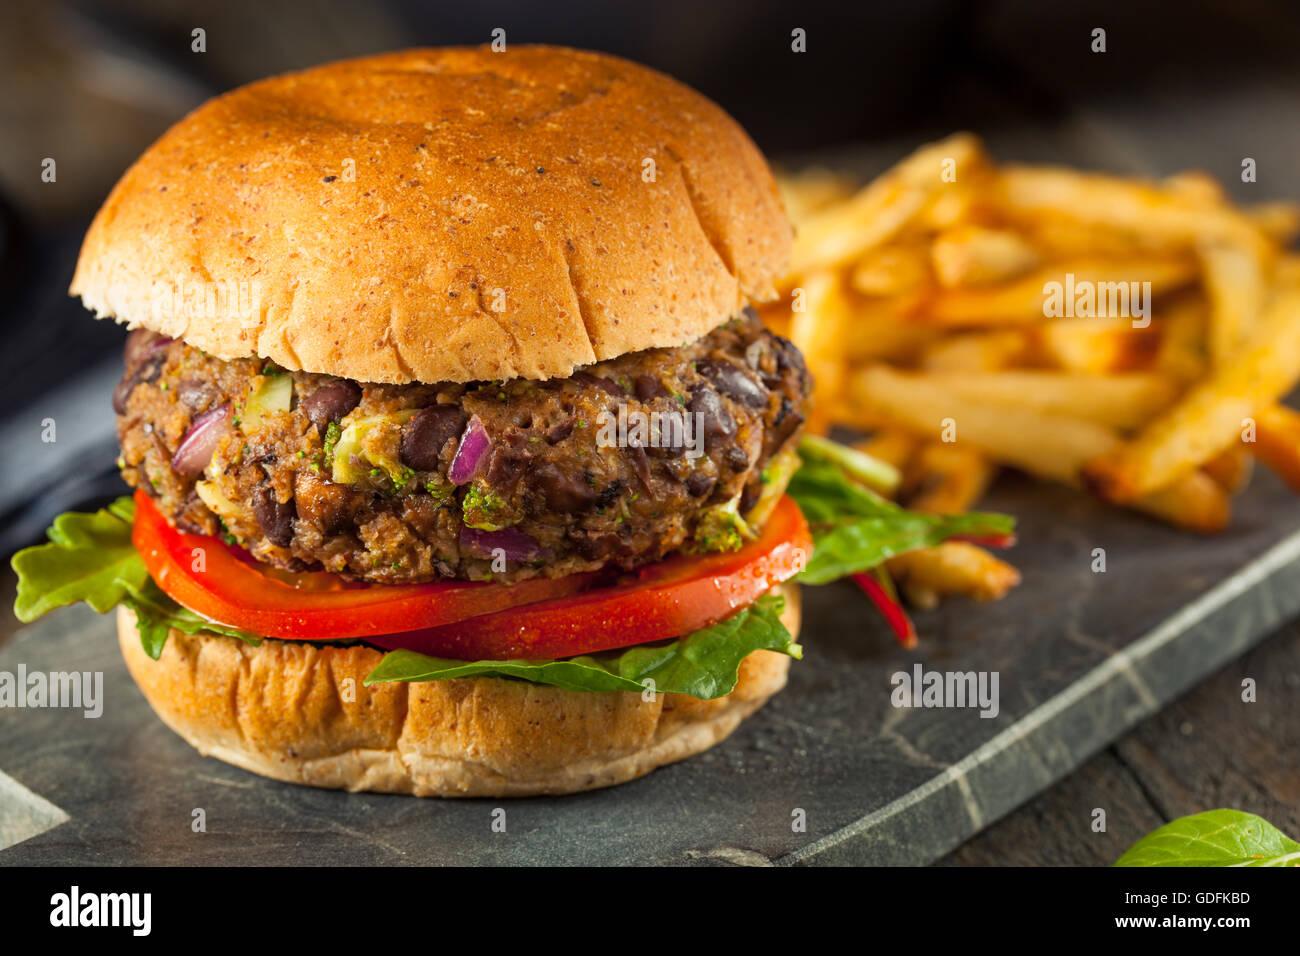 Vegane hausgemachte Portabello Pilz Black Bean Burger mit Pommes frites Stockbild